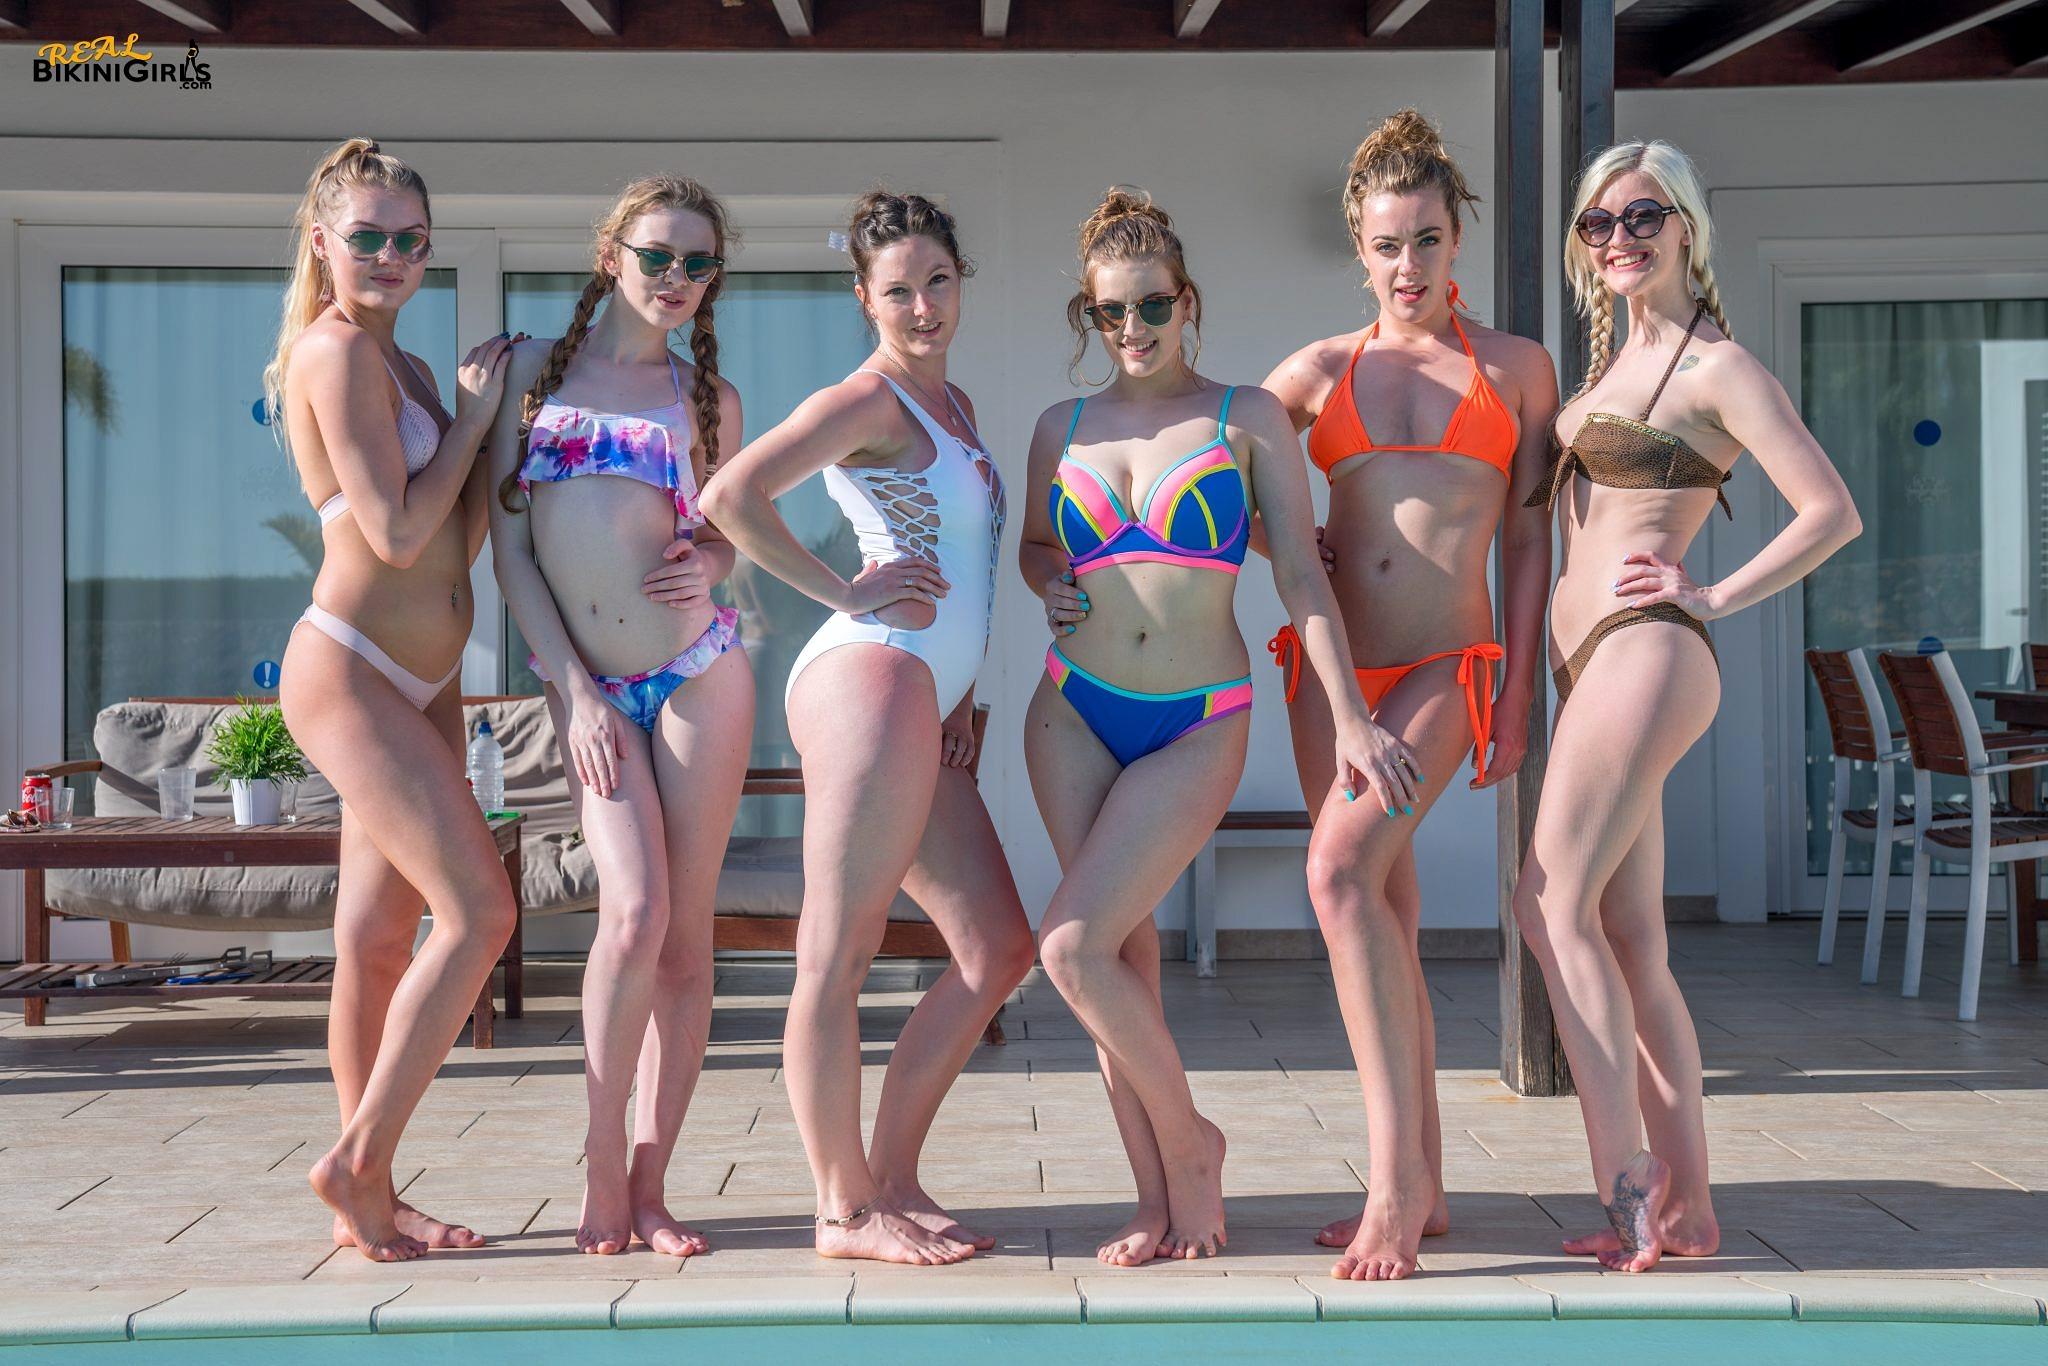 Bikini girls real, girls pissing on a sidewalk